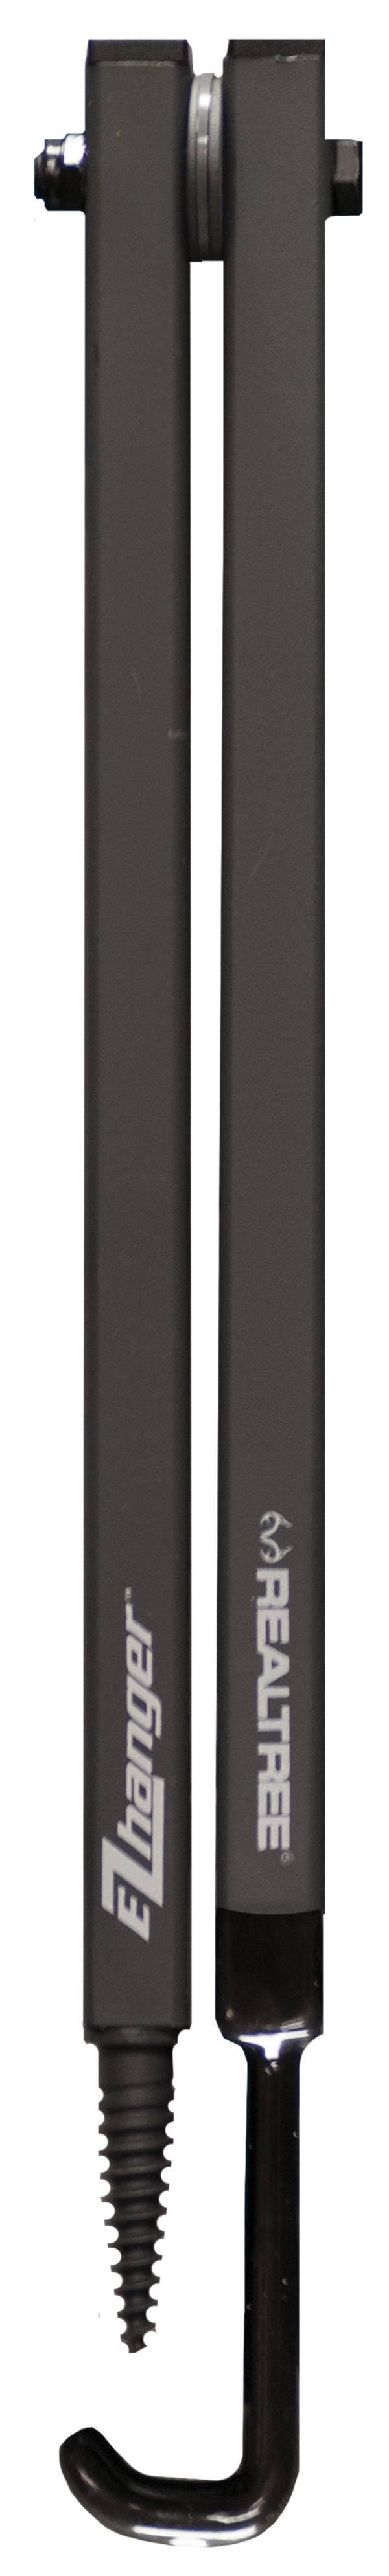 Realtree Multi-Purpose EZ Hanger product image